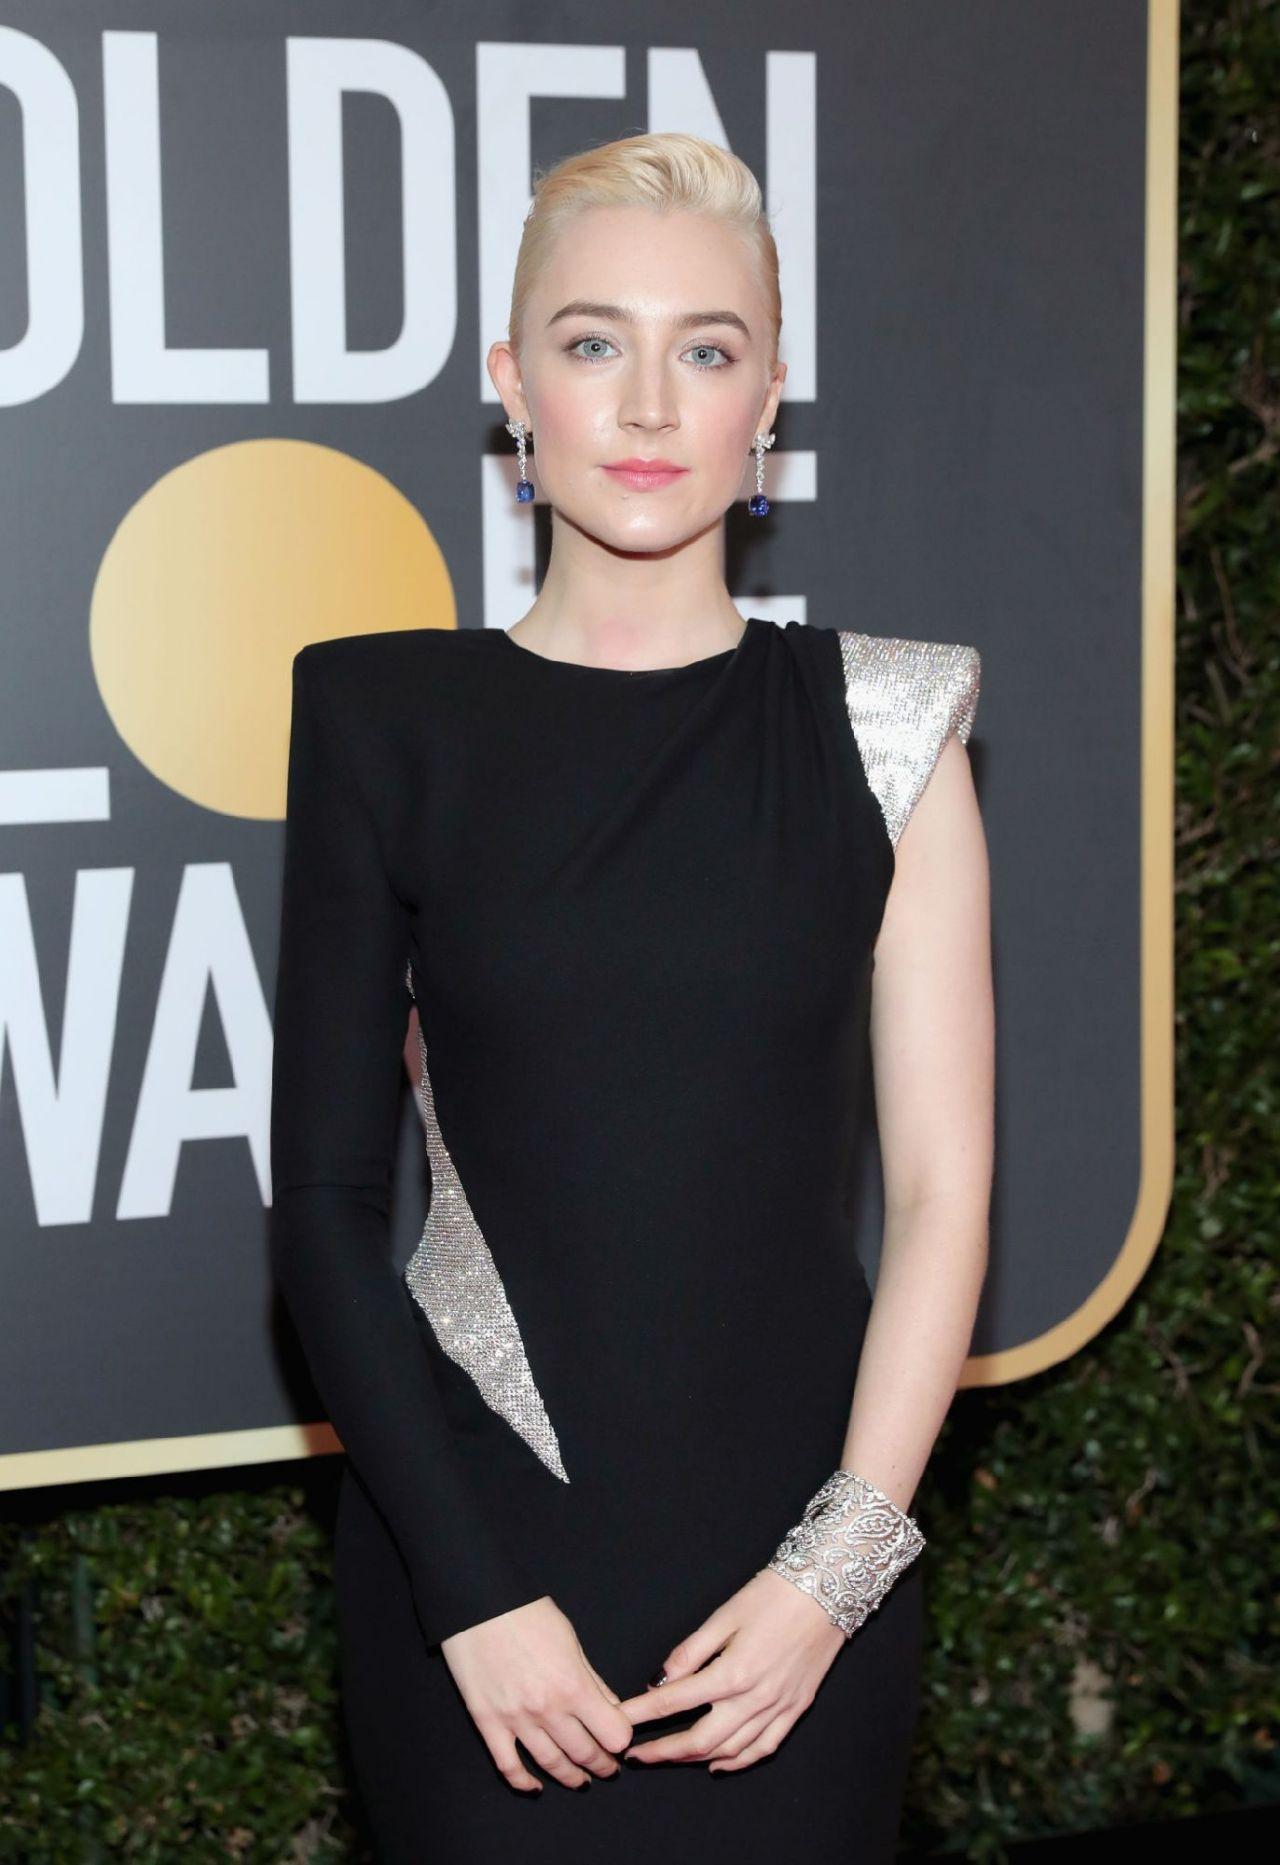 http://celebmafia.com/wp-content/uploads/2018/01/saoirse-ronan-golden-globe-awards-2018-4.jpg